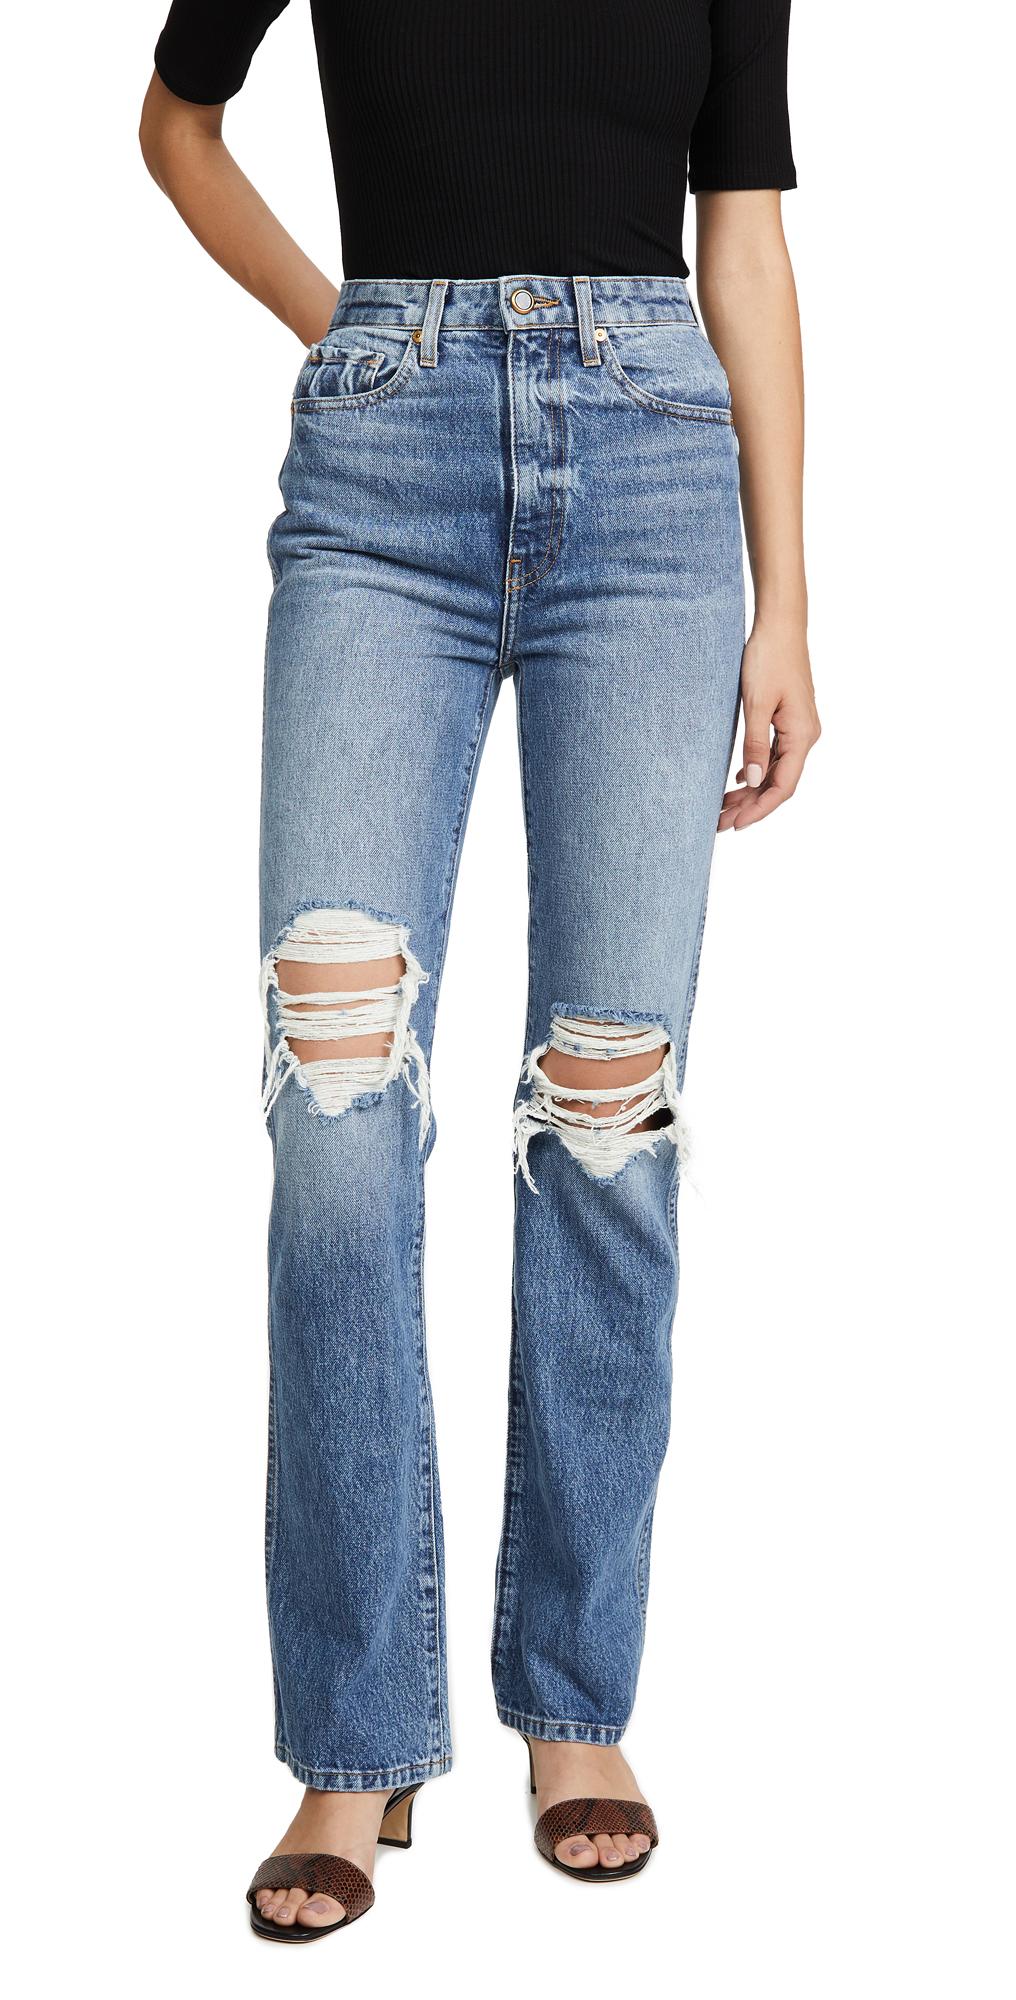 Khaite Danielle High Rise Stovepipe Jeans